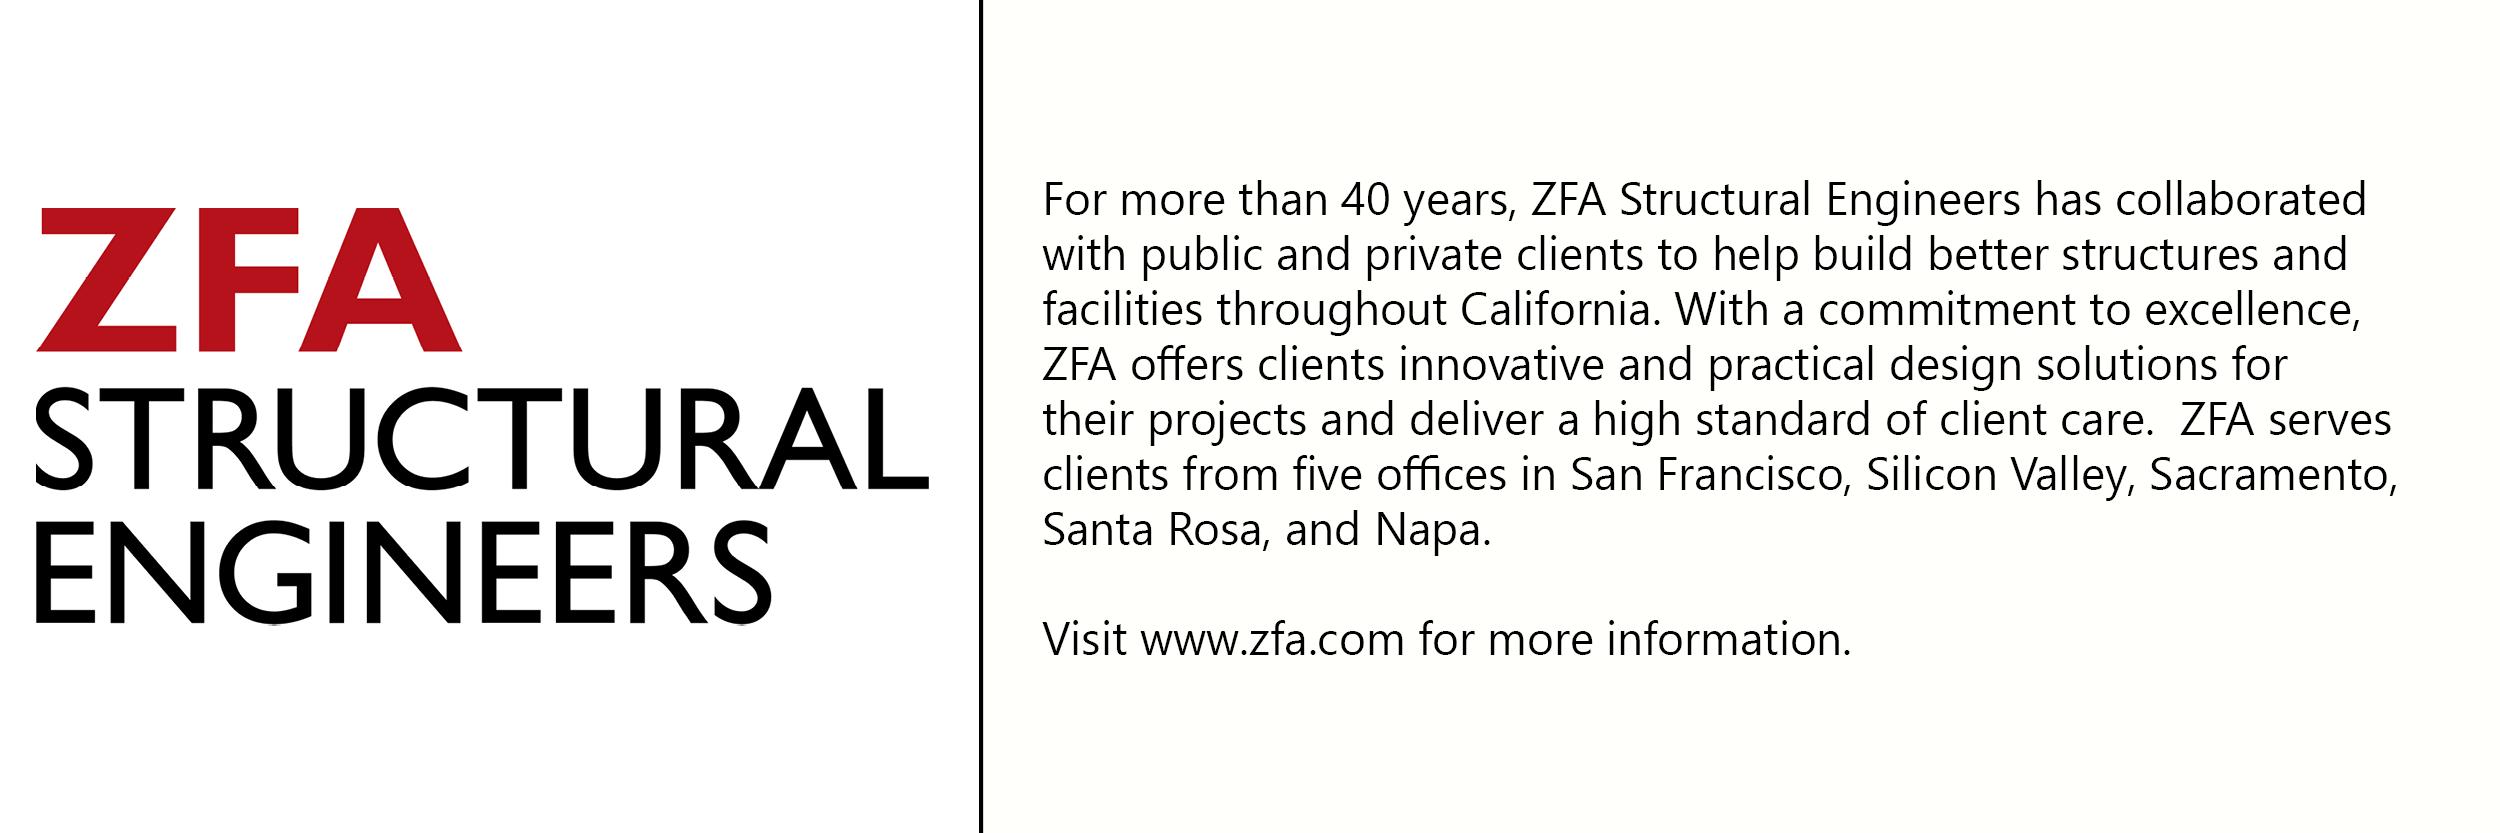 ZFA logo with description of company